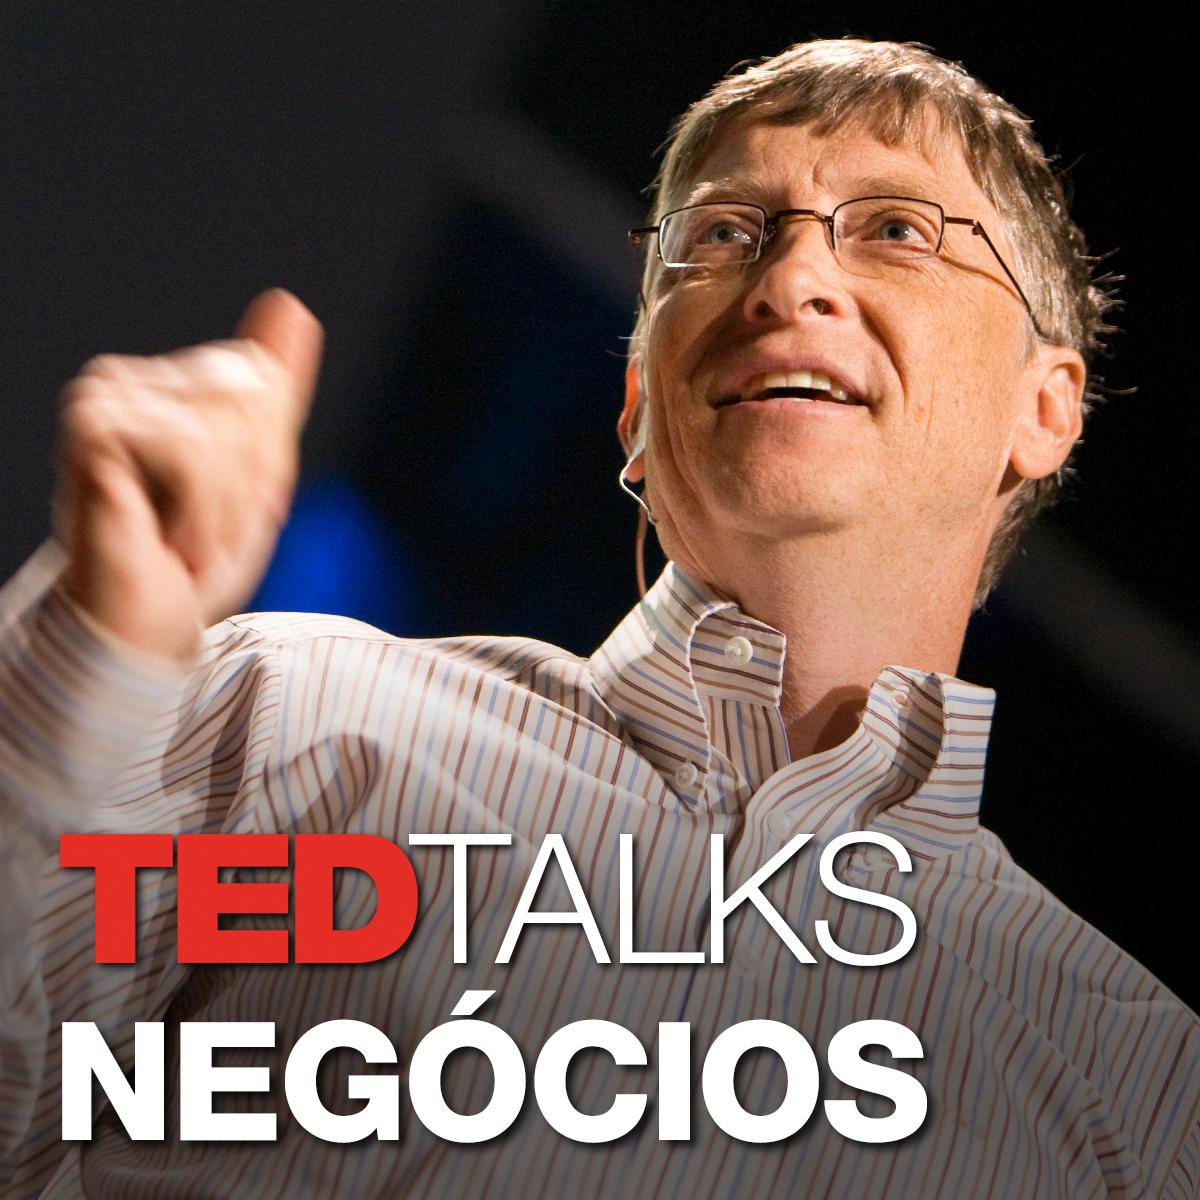 TEDTalks Negócios